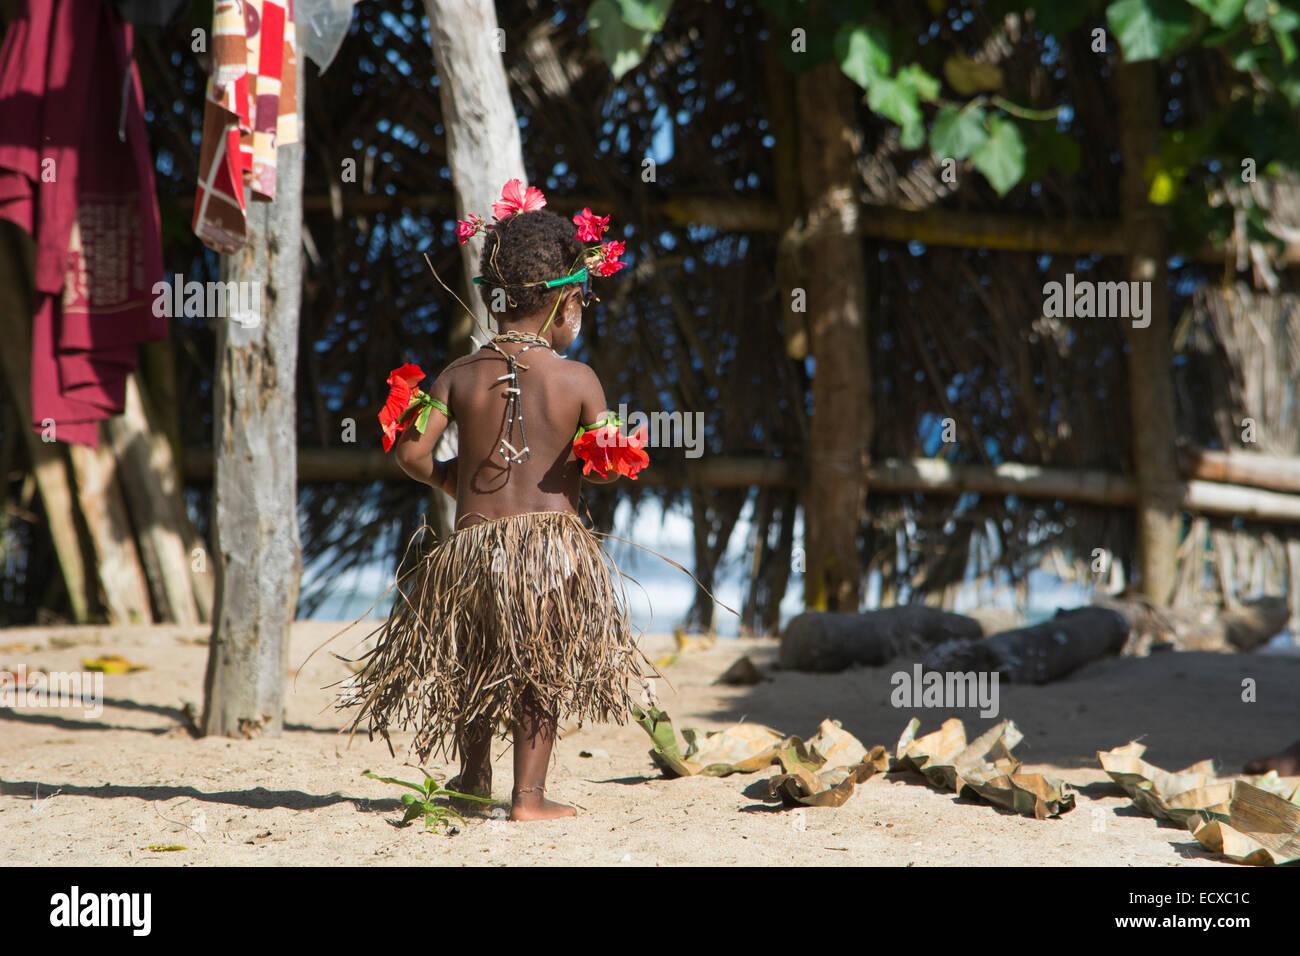 Melanesia, Papua New Guinea, Bismark Sea area, Tuam Island, Tuam village. Young girl in grass skirt dressed for - Stock Image